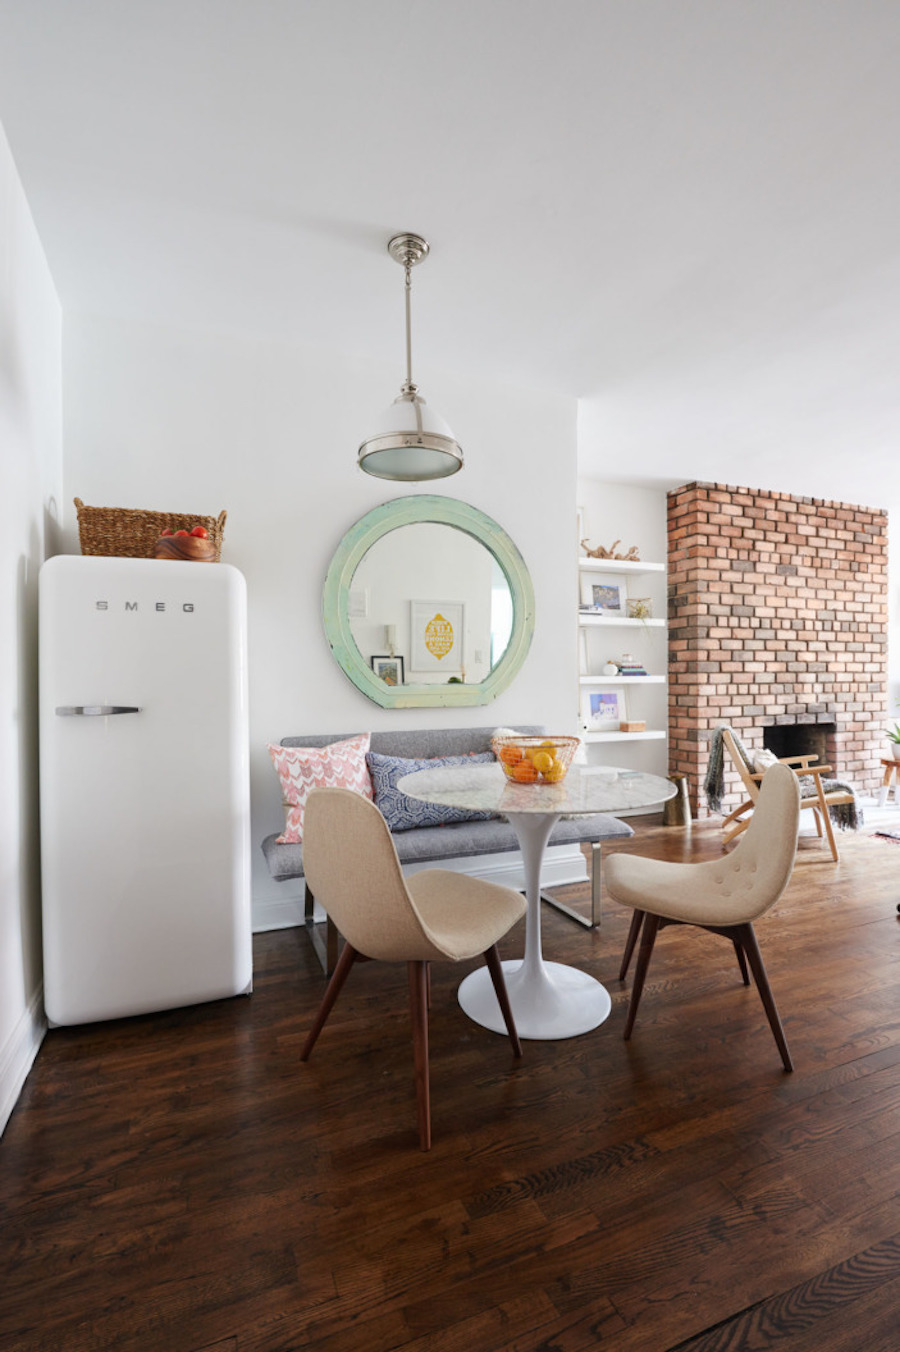 Dining nook with white SMEG fridge